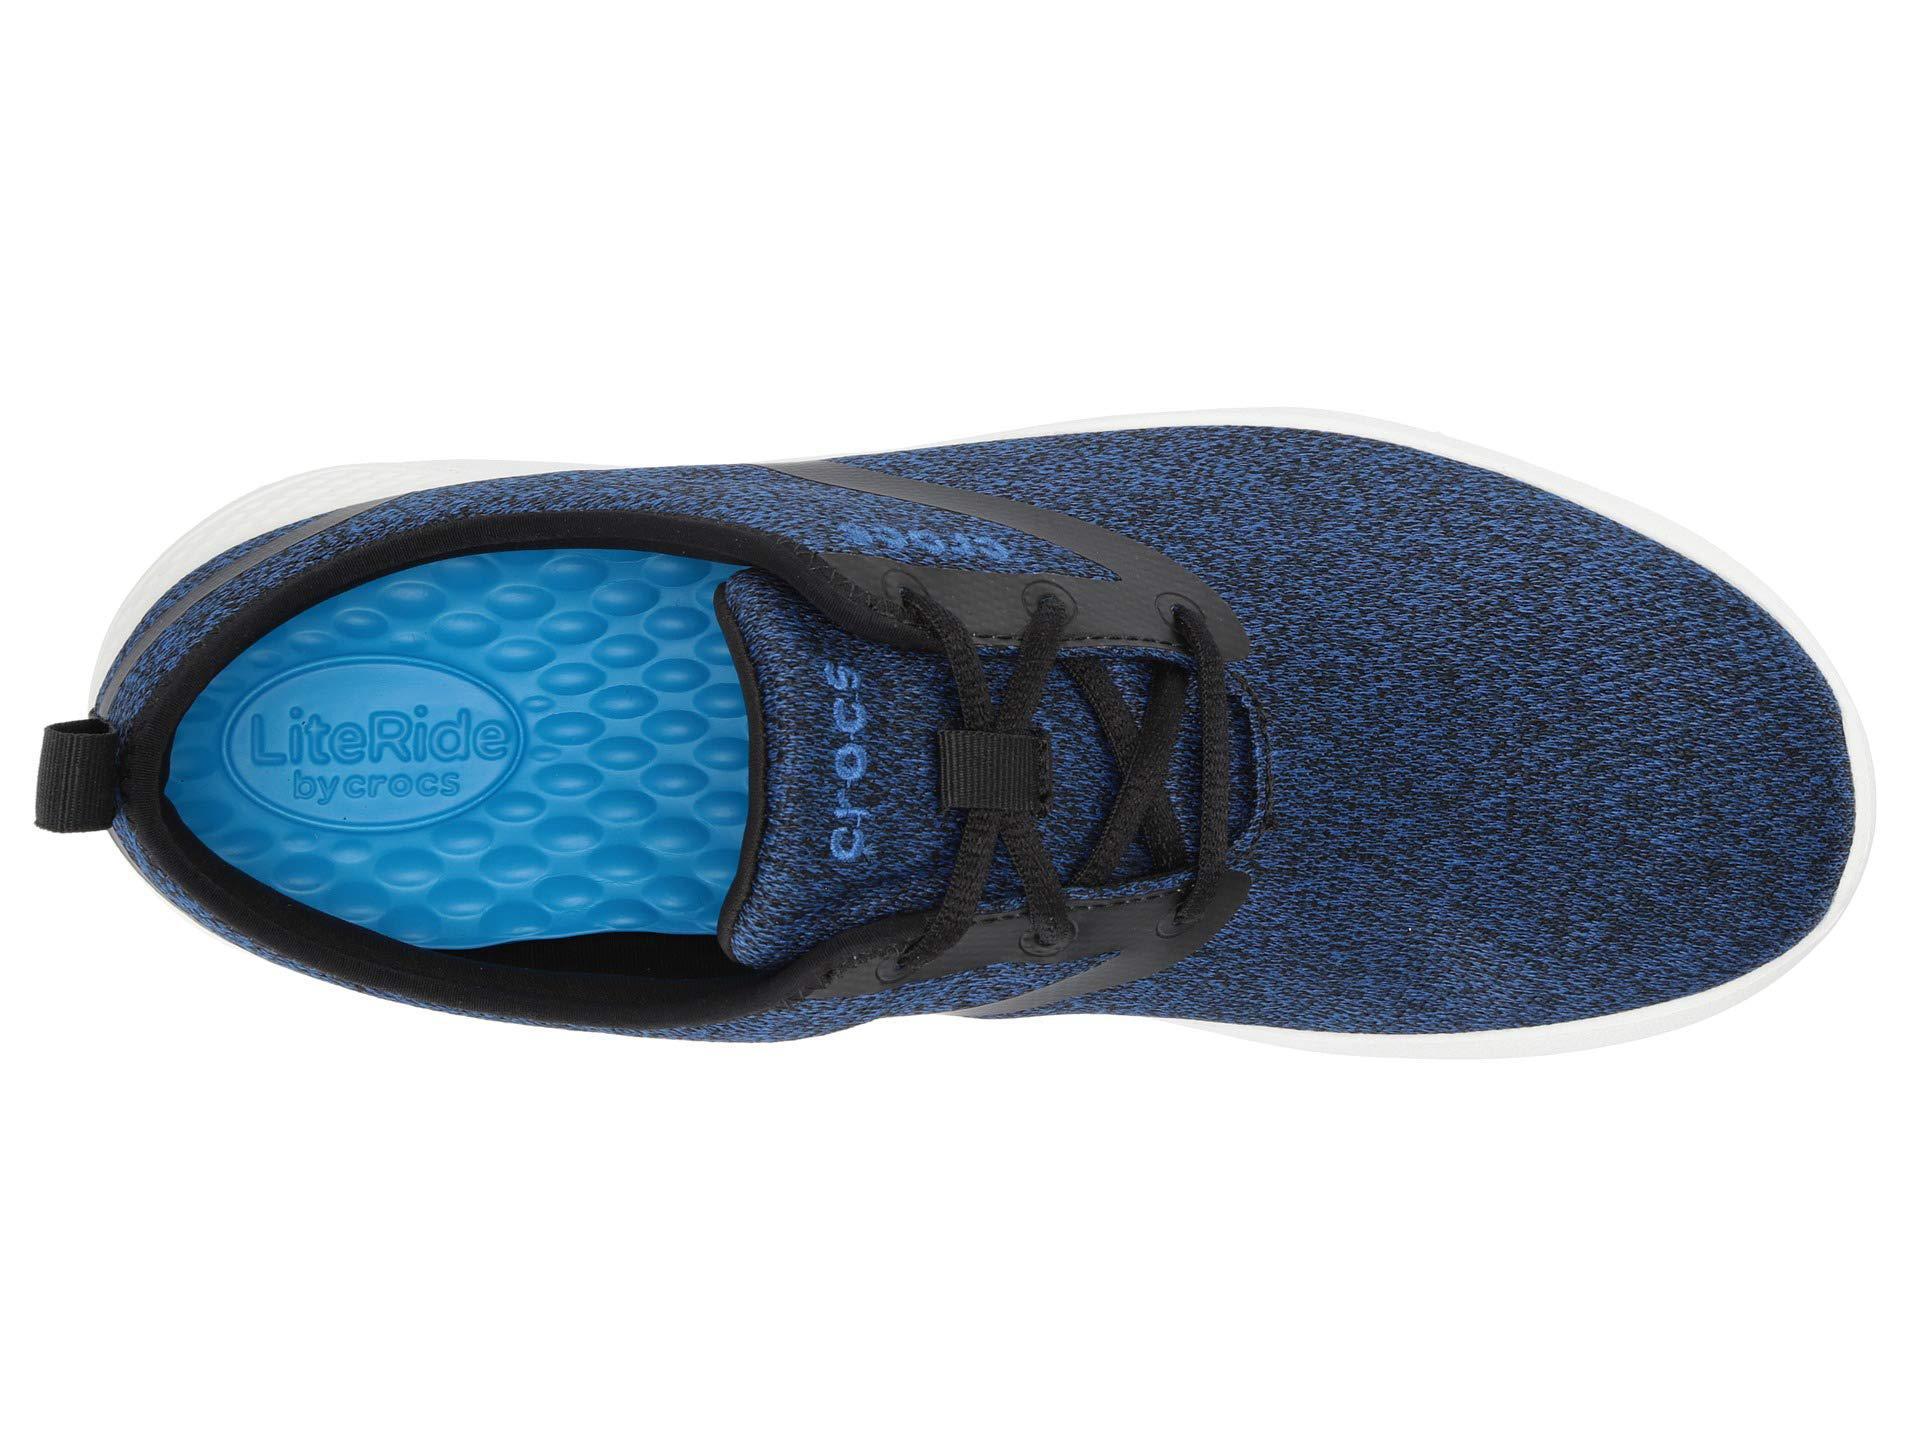 0eaa170d7e Crocs™ - Blue Literide Lace for Men - Lyst. View fullscreen